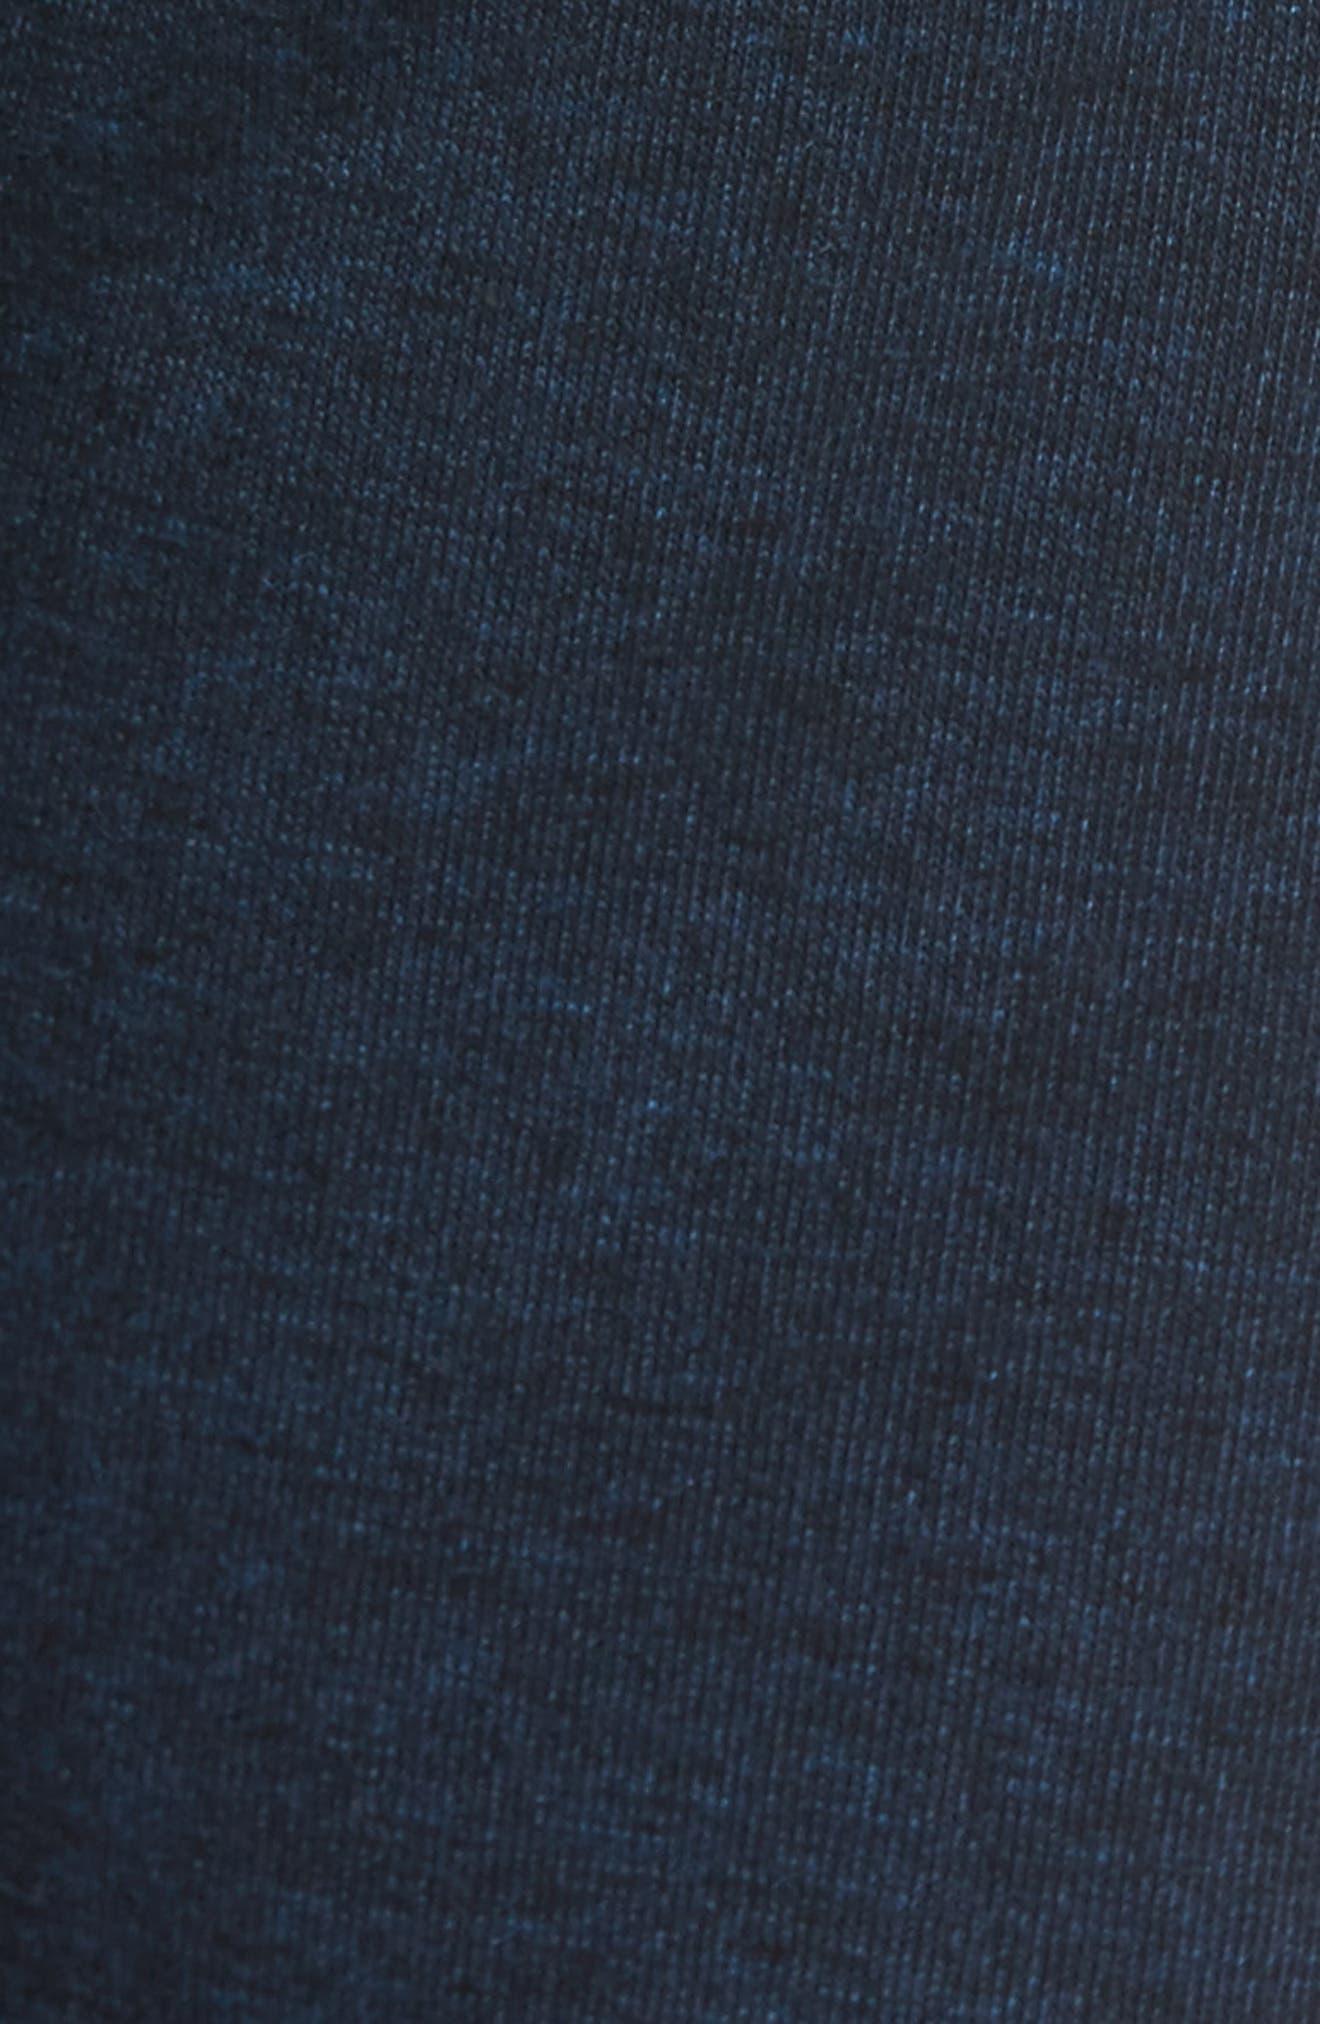 Fleece Shorts,                             Alternate thumbnail 5, color,                             NAVY PEACOAT